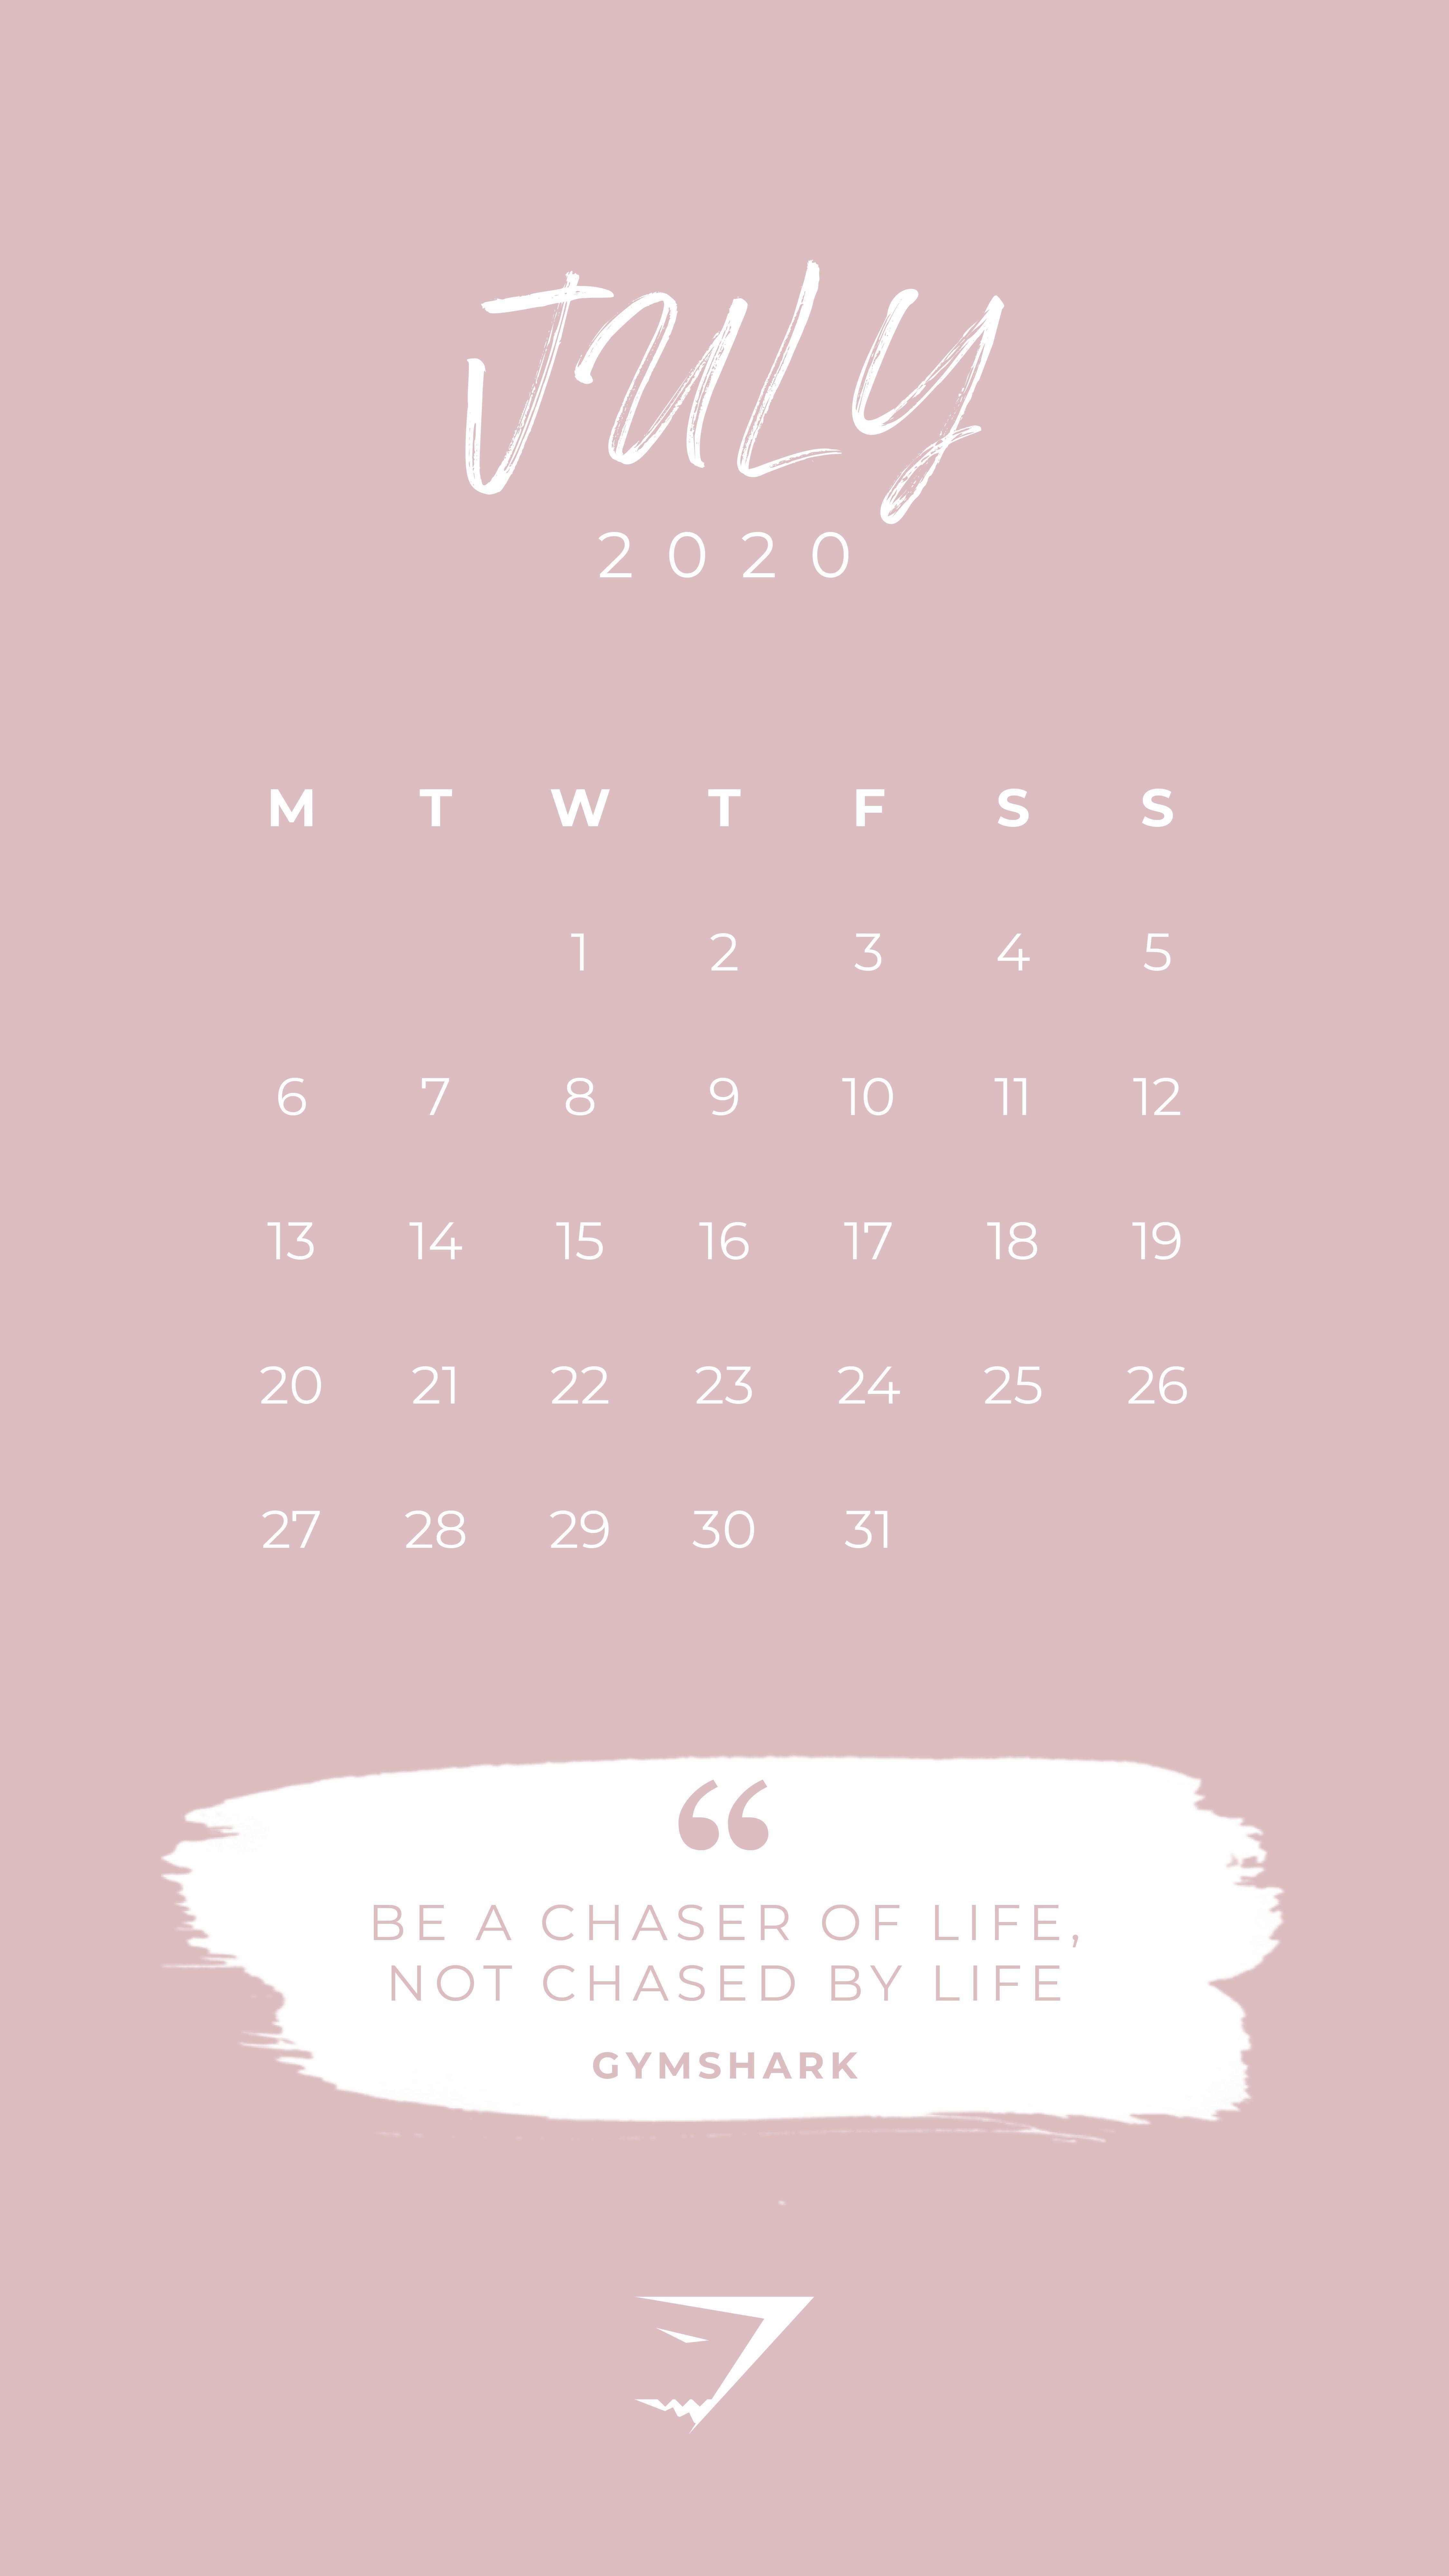 Good Free 2020 July Calendar Popular Currently Have You Were Given An Organizati 4k Di 2020 Kalender Kata Kata Indah Ide Pesta